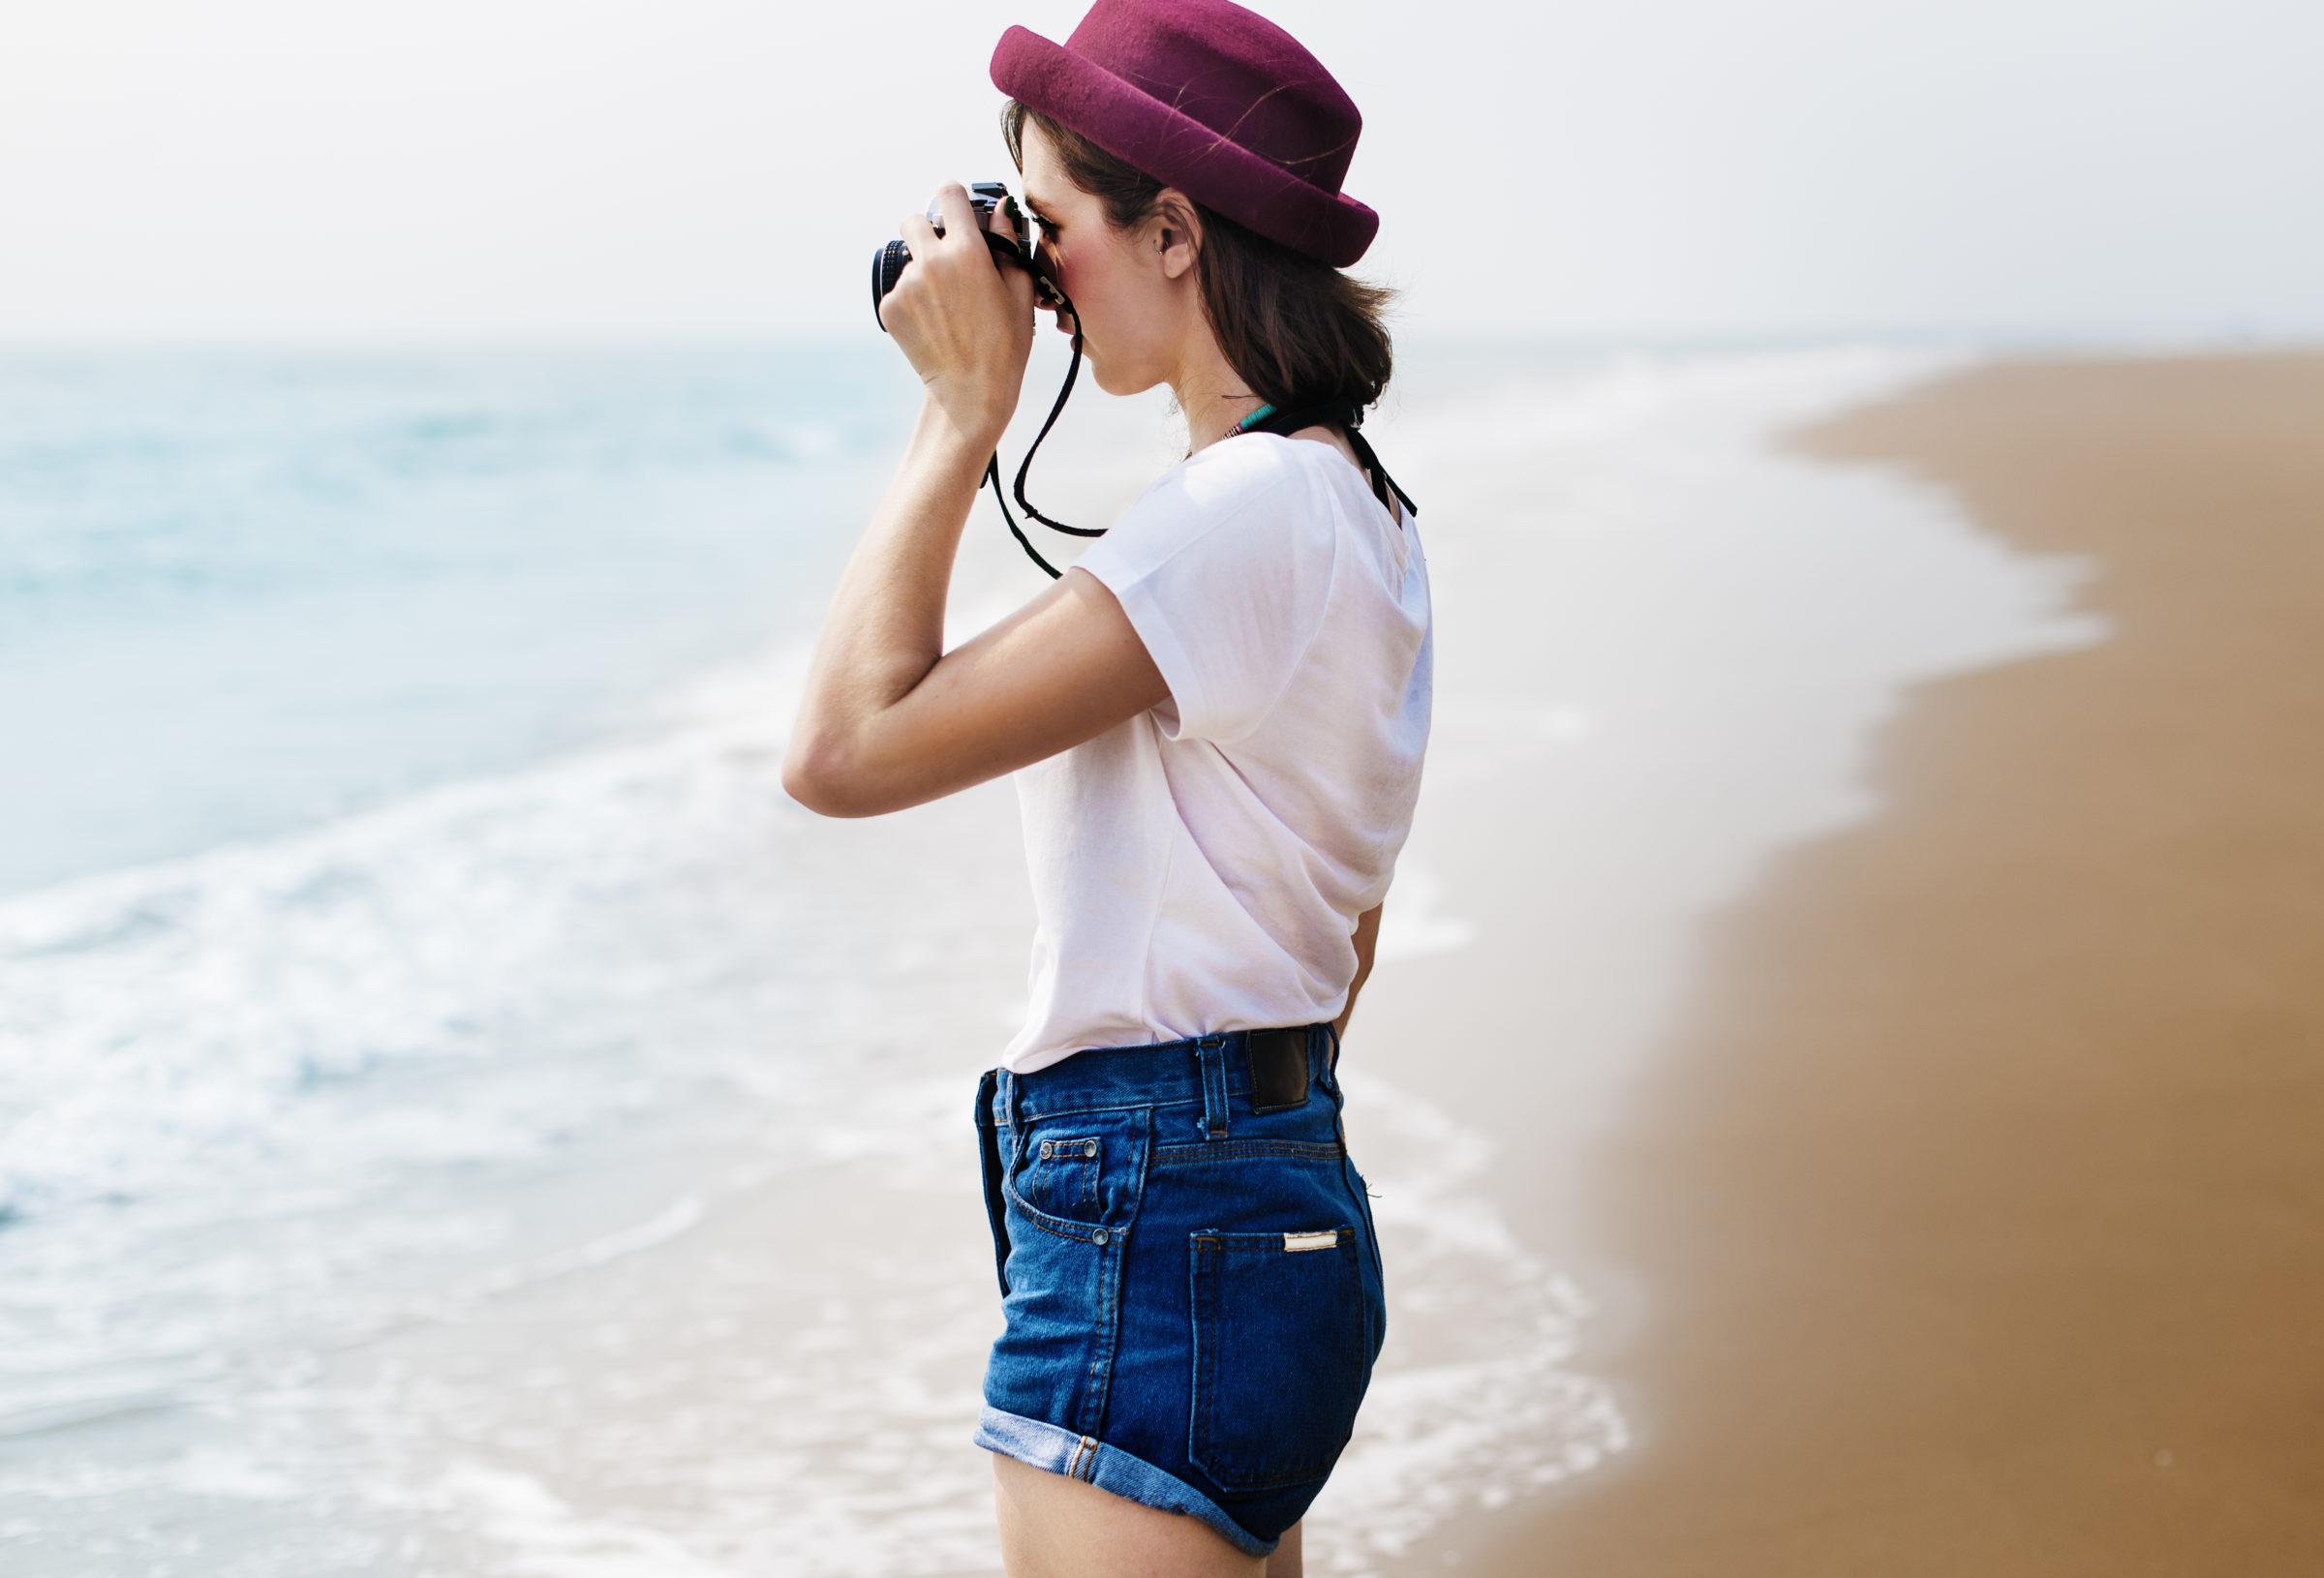 beach summer holiday vacation traveling photograph PQG8B3W